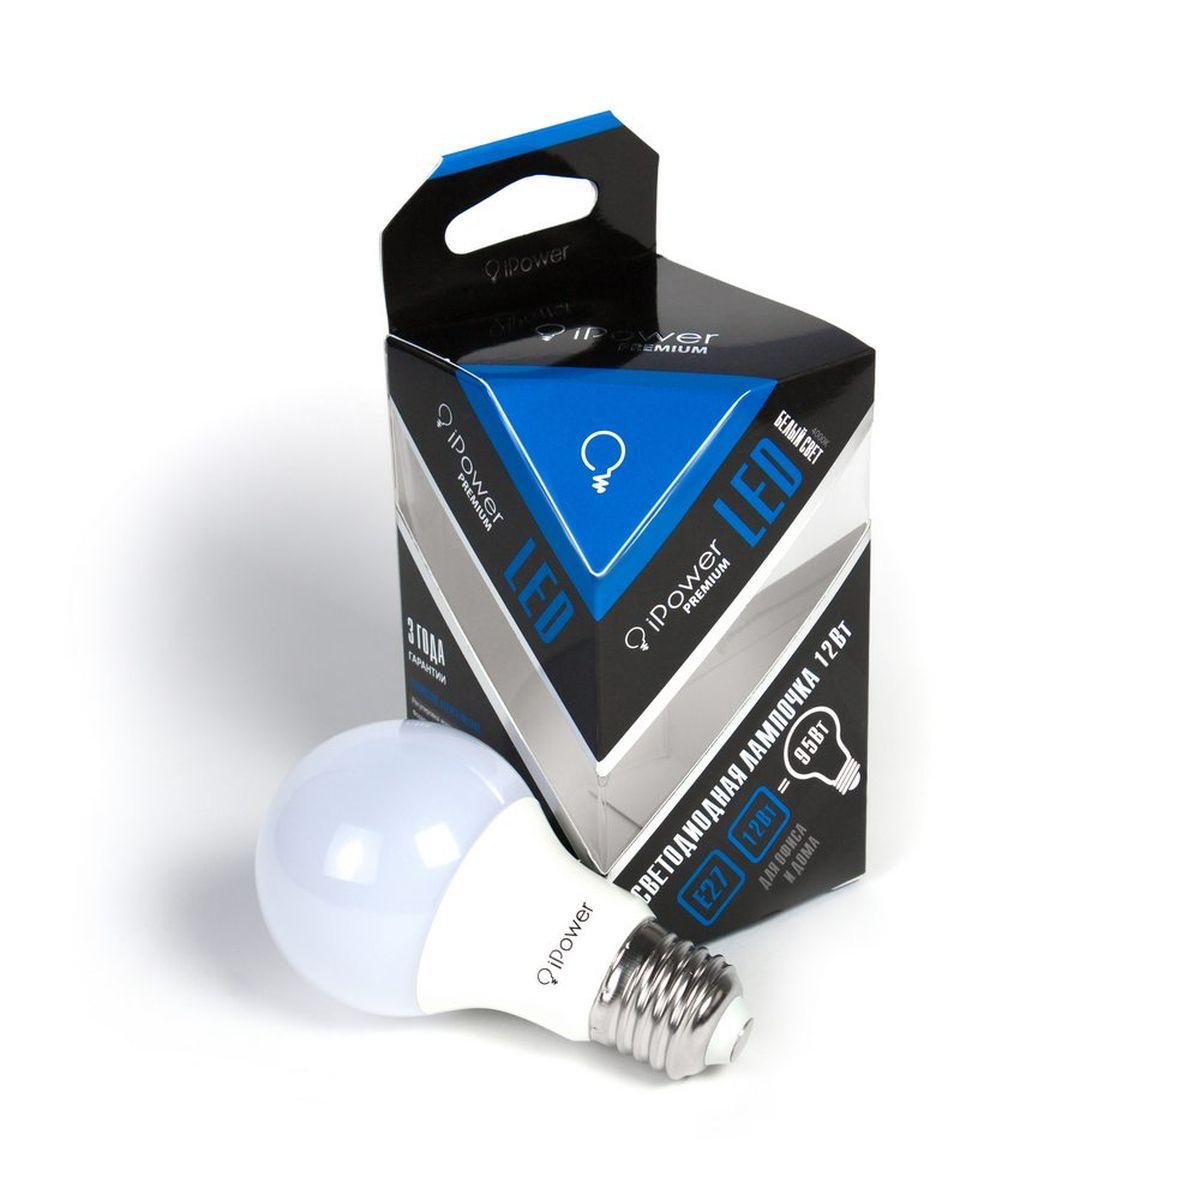 ����� ������������ IPower Premium, LED, ������ �27, 12W, 4000� ����� ����